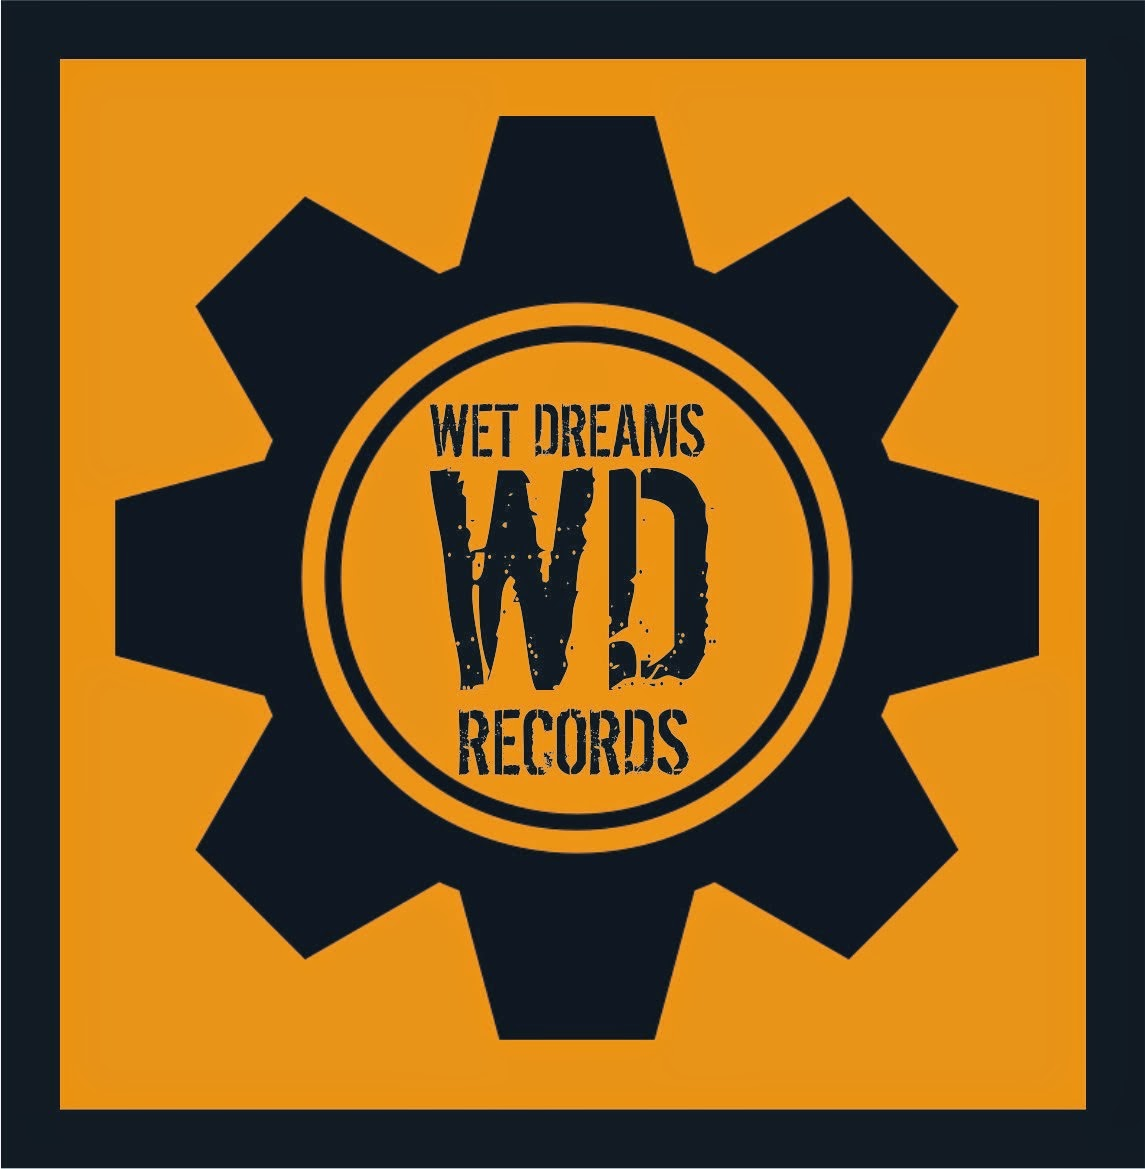 WET DREAMS RECORDS NETLABEL